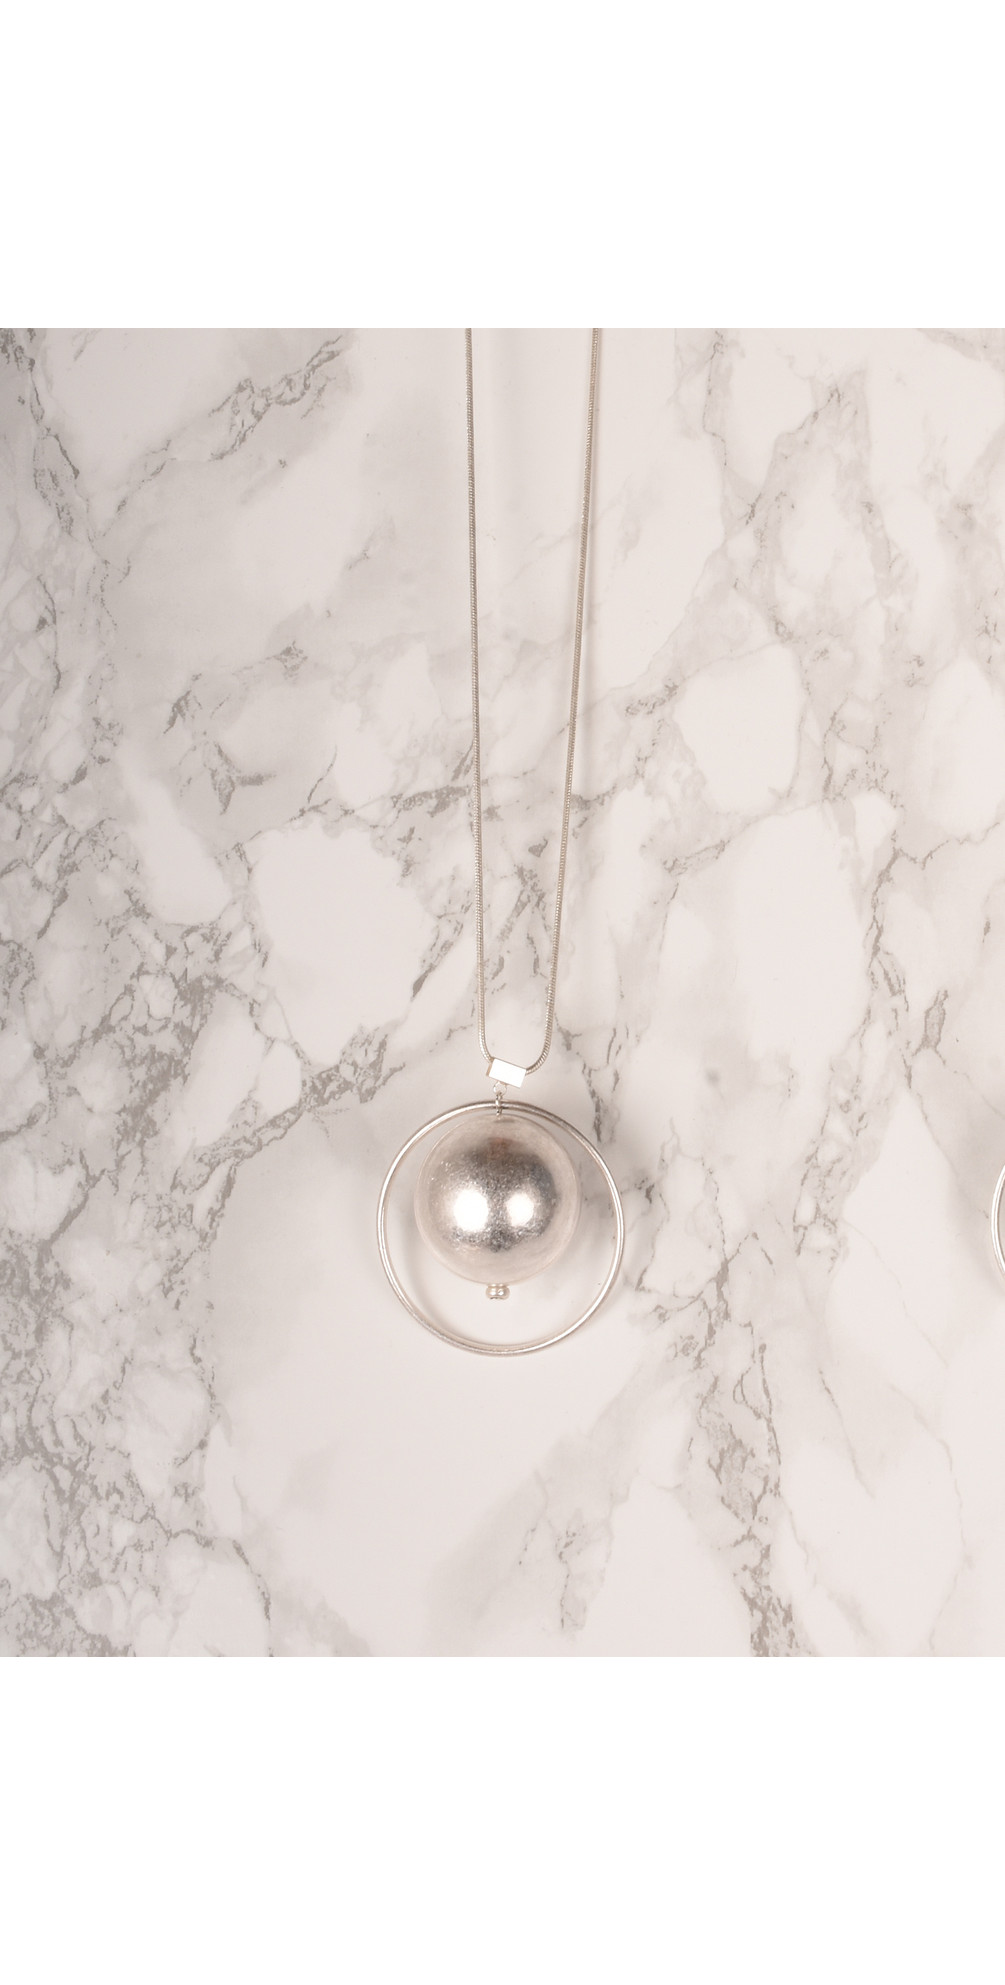 Sorbi Long Orbit Necklace main image